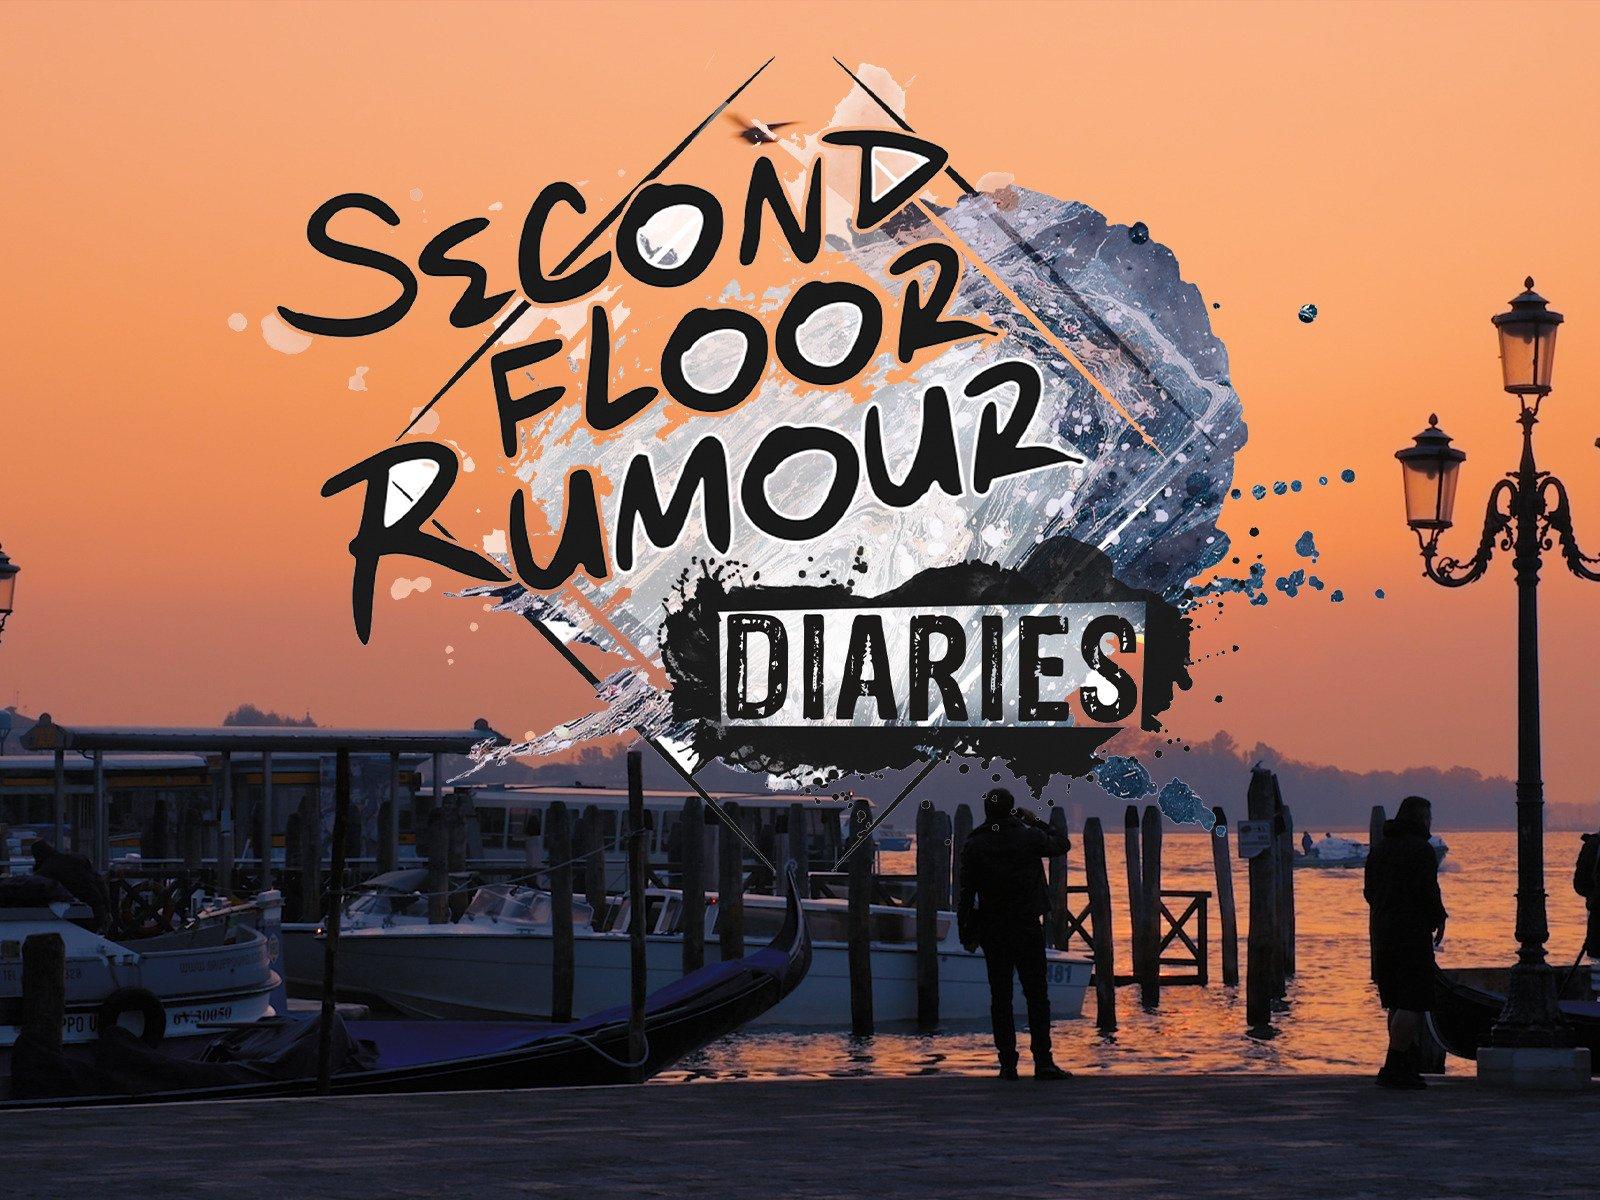 Second Floor Rumour